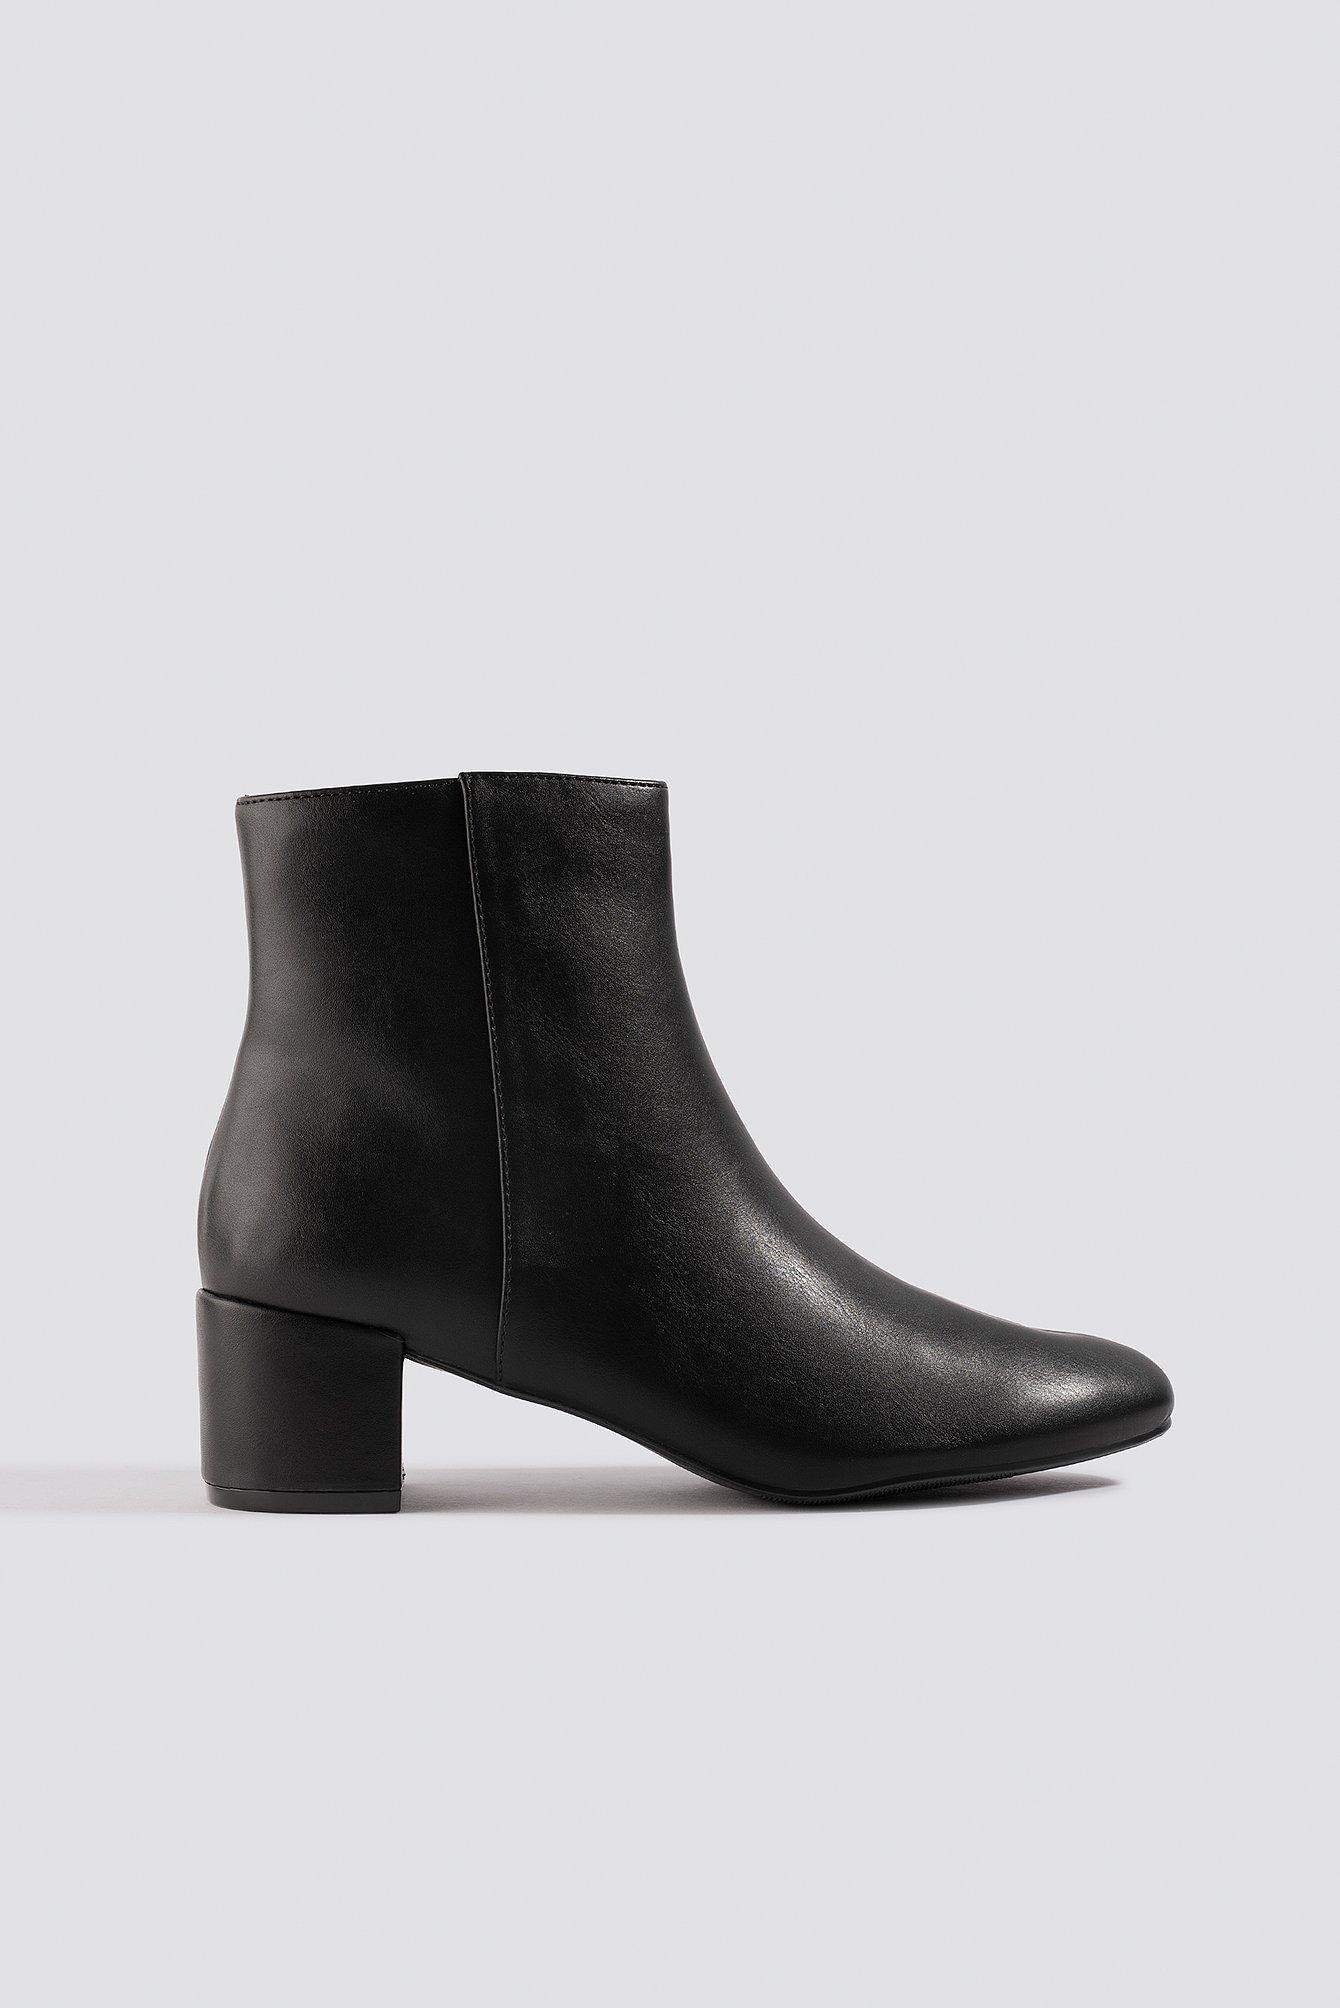 Soft Low Heel Booties Black   na-kd.com